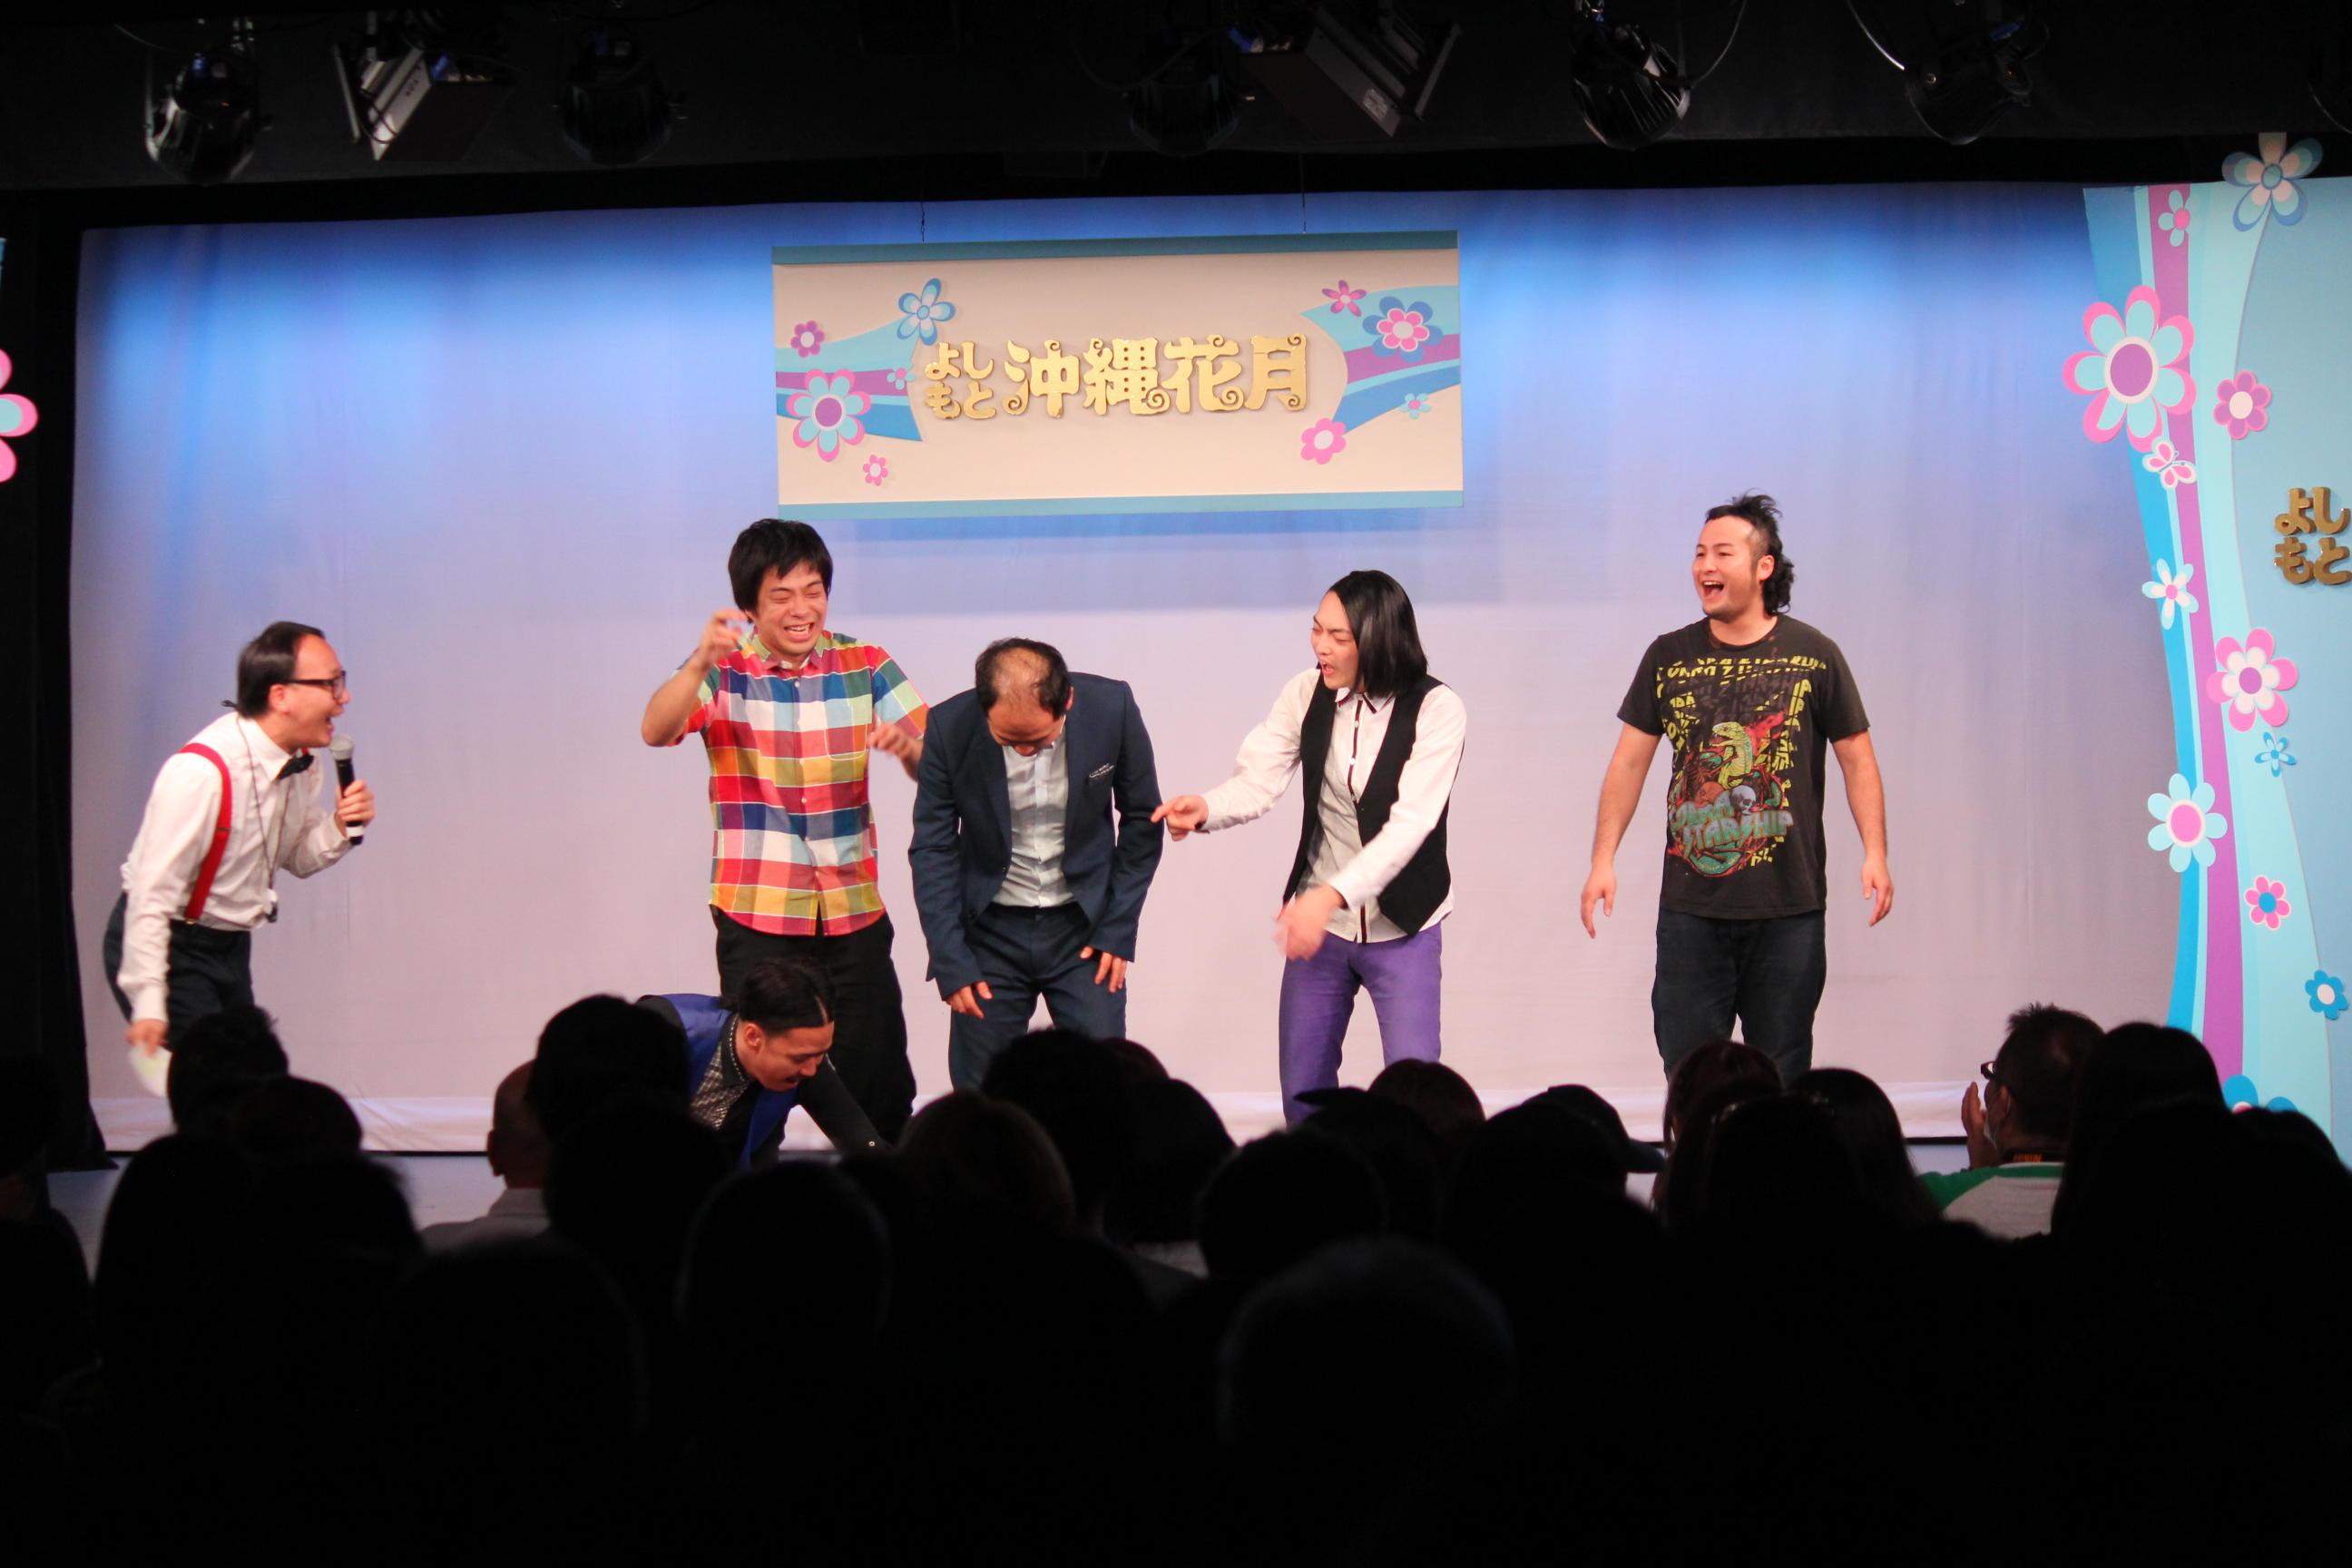 http://news.yoshimoto.co.jp/20151201143249-203522d575f645410af7e4821e293a6db8342265.jpg